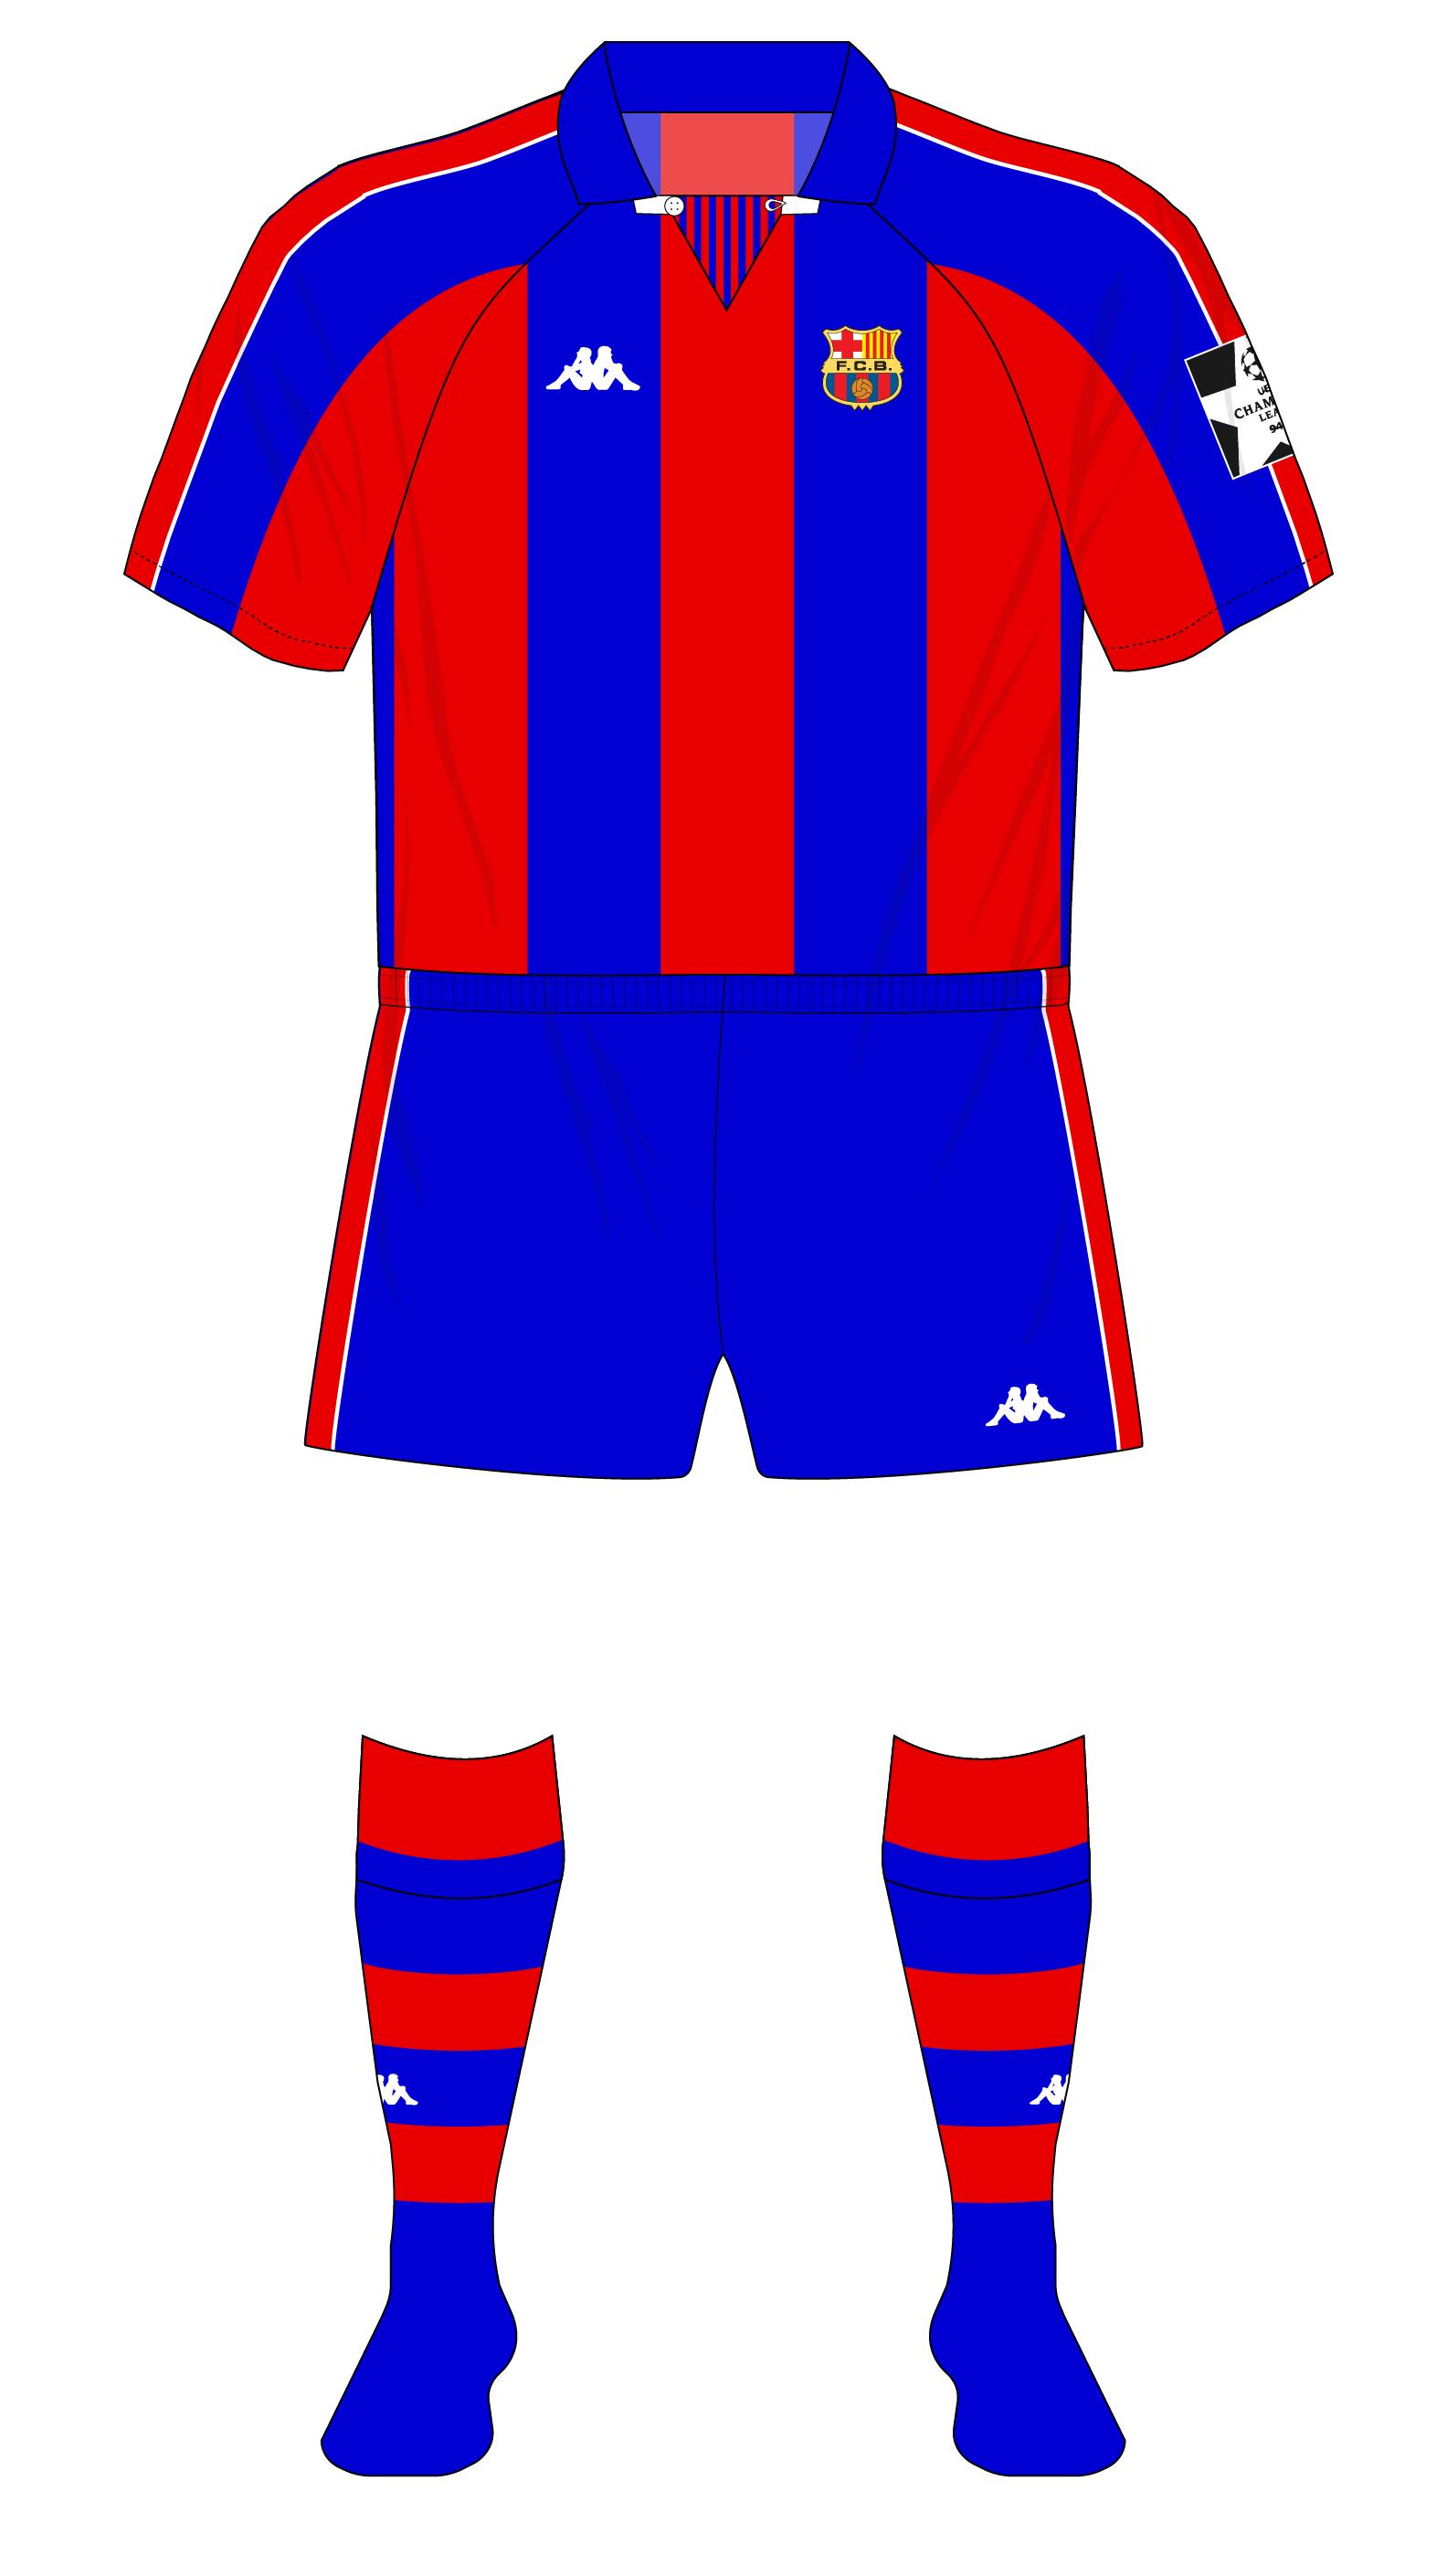 online store 9239a becde Barcelona-1994-1995-Kappa-European-kit-01 | RB Jerseys